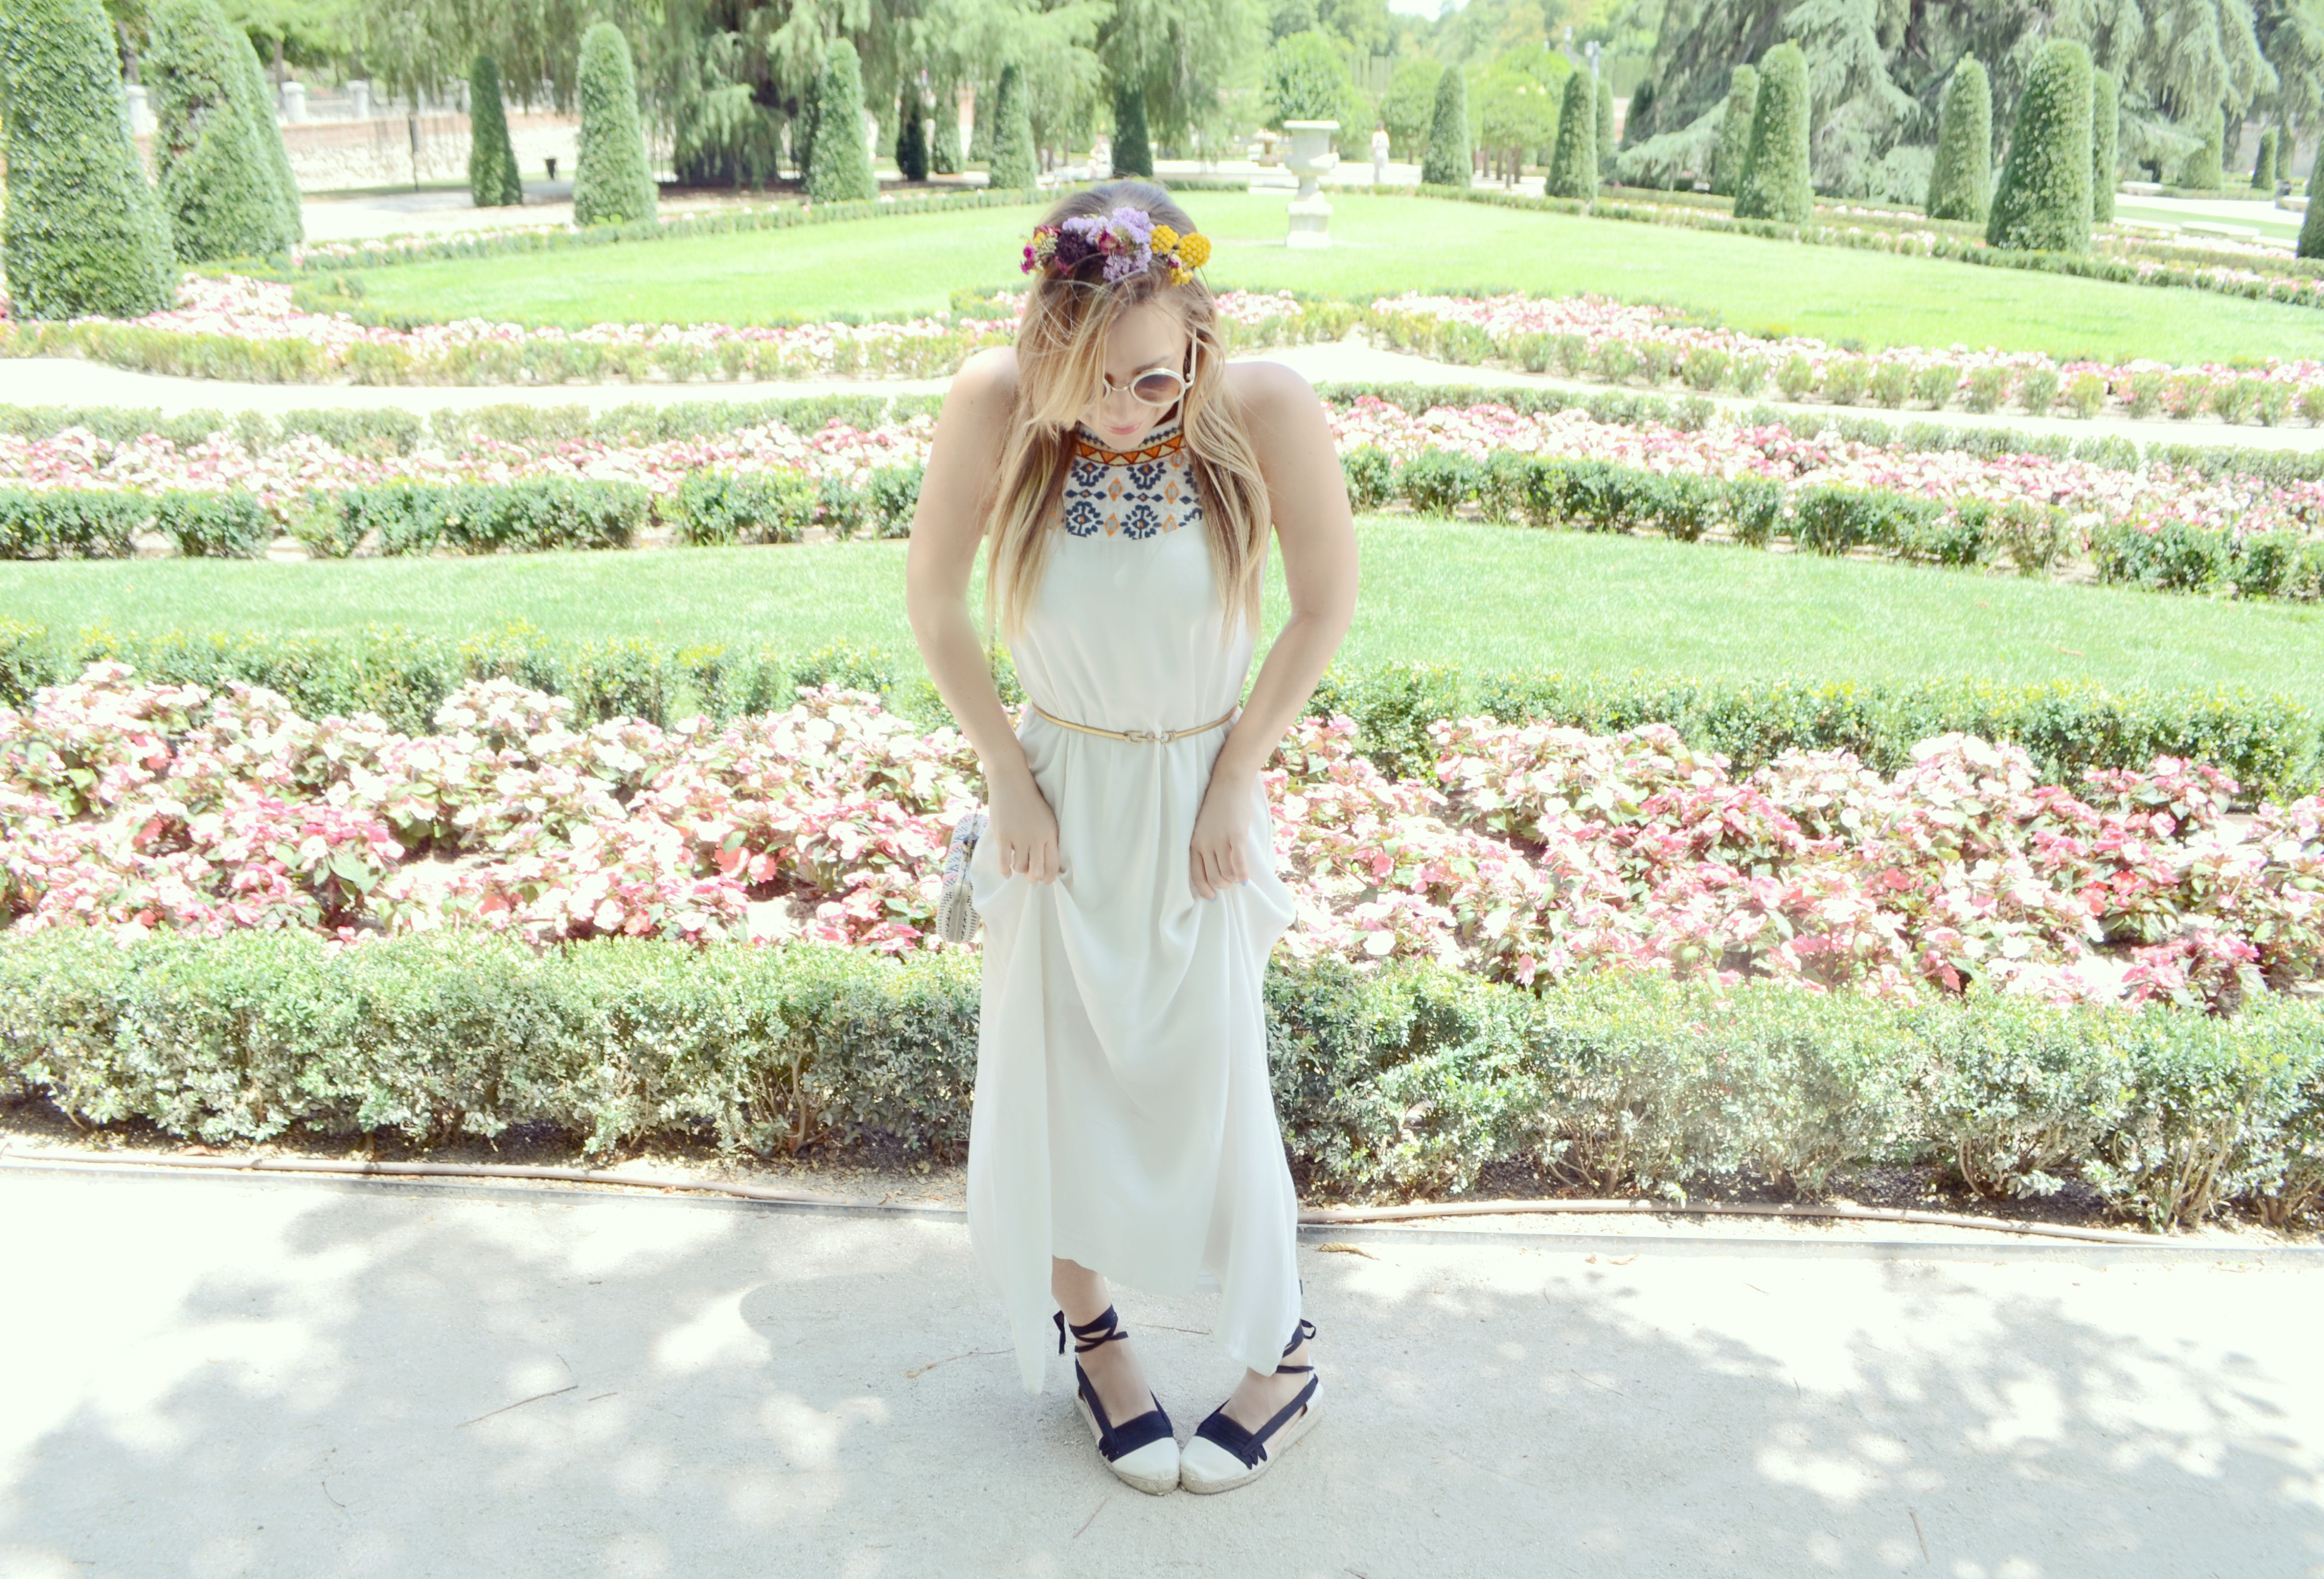 Vestidos-largos-fashionista-ChicAdicta-blog-de-moda-influencer-Madrid-Chic-Adicta-surkana-dona-alpargata-PiensaenChic-Piensa-en-Chic